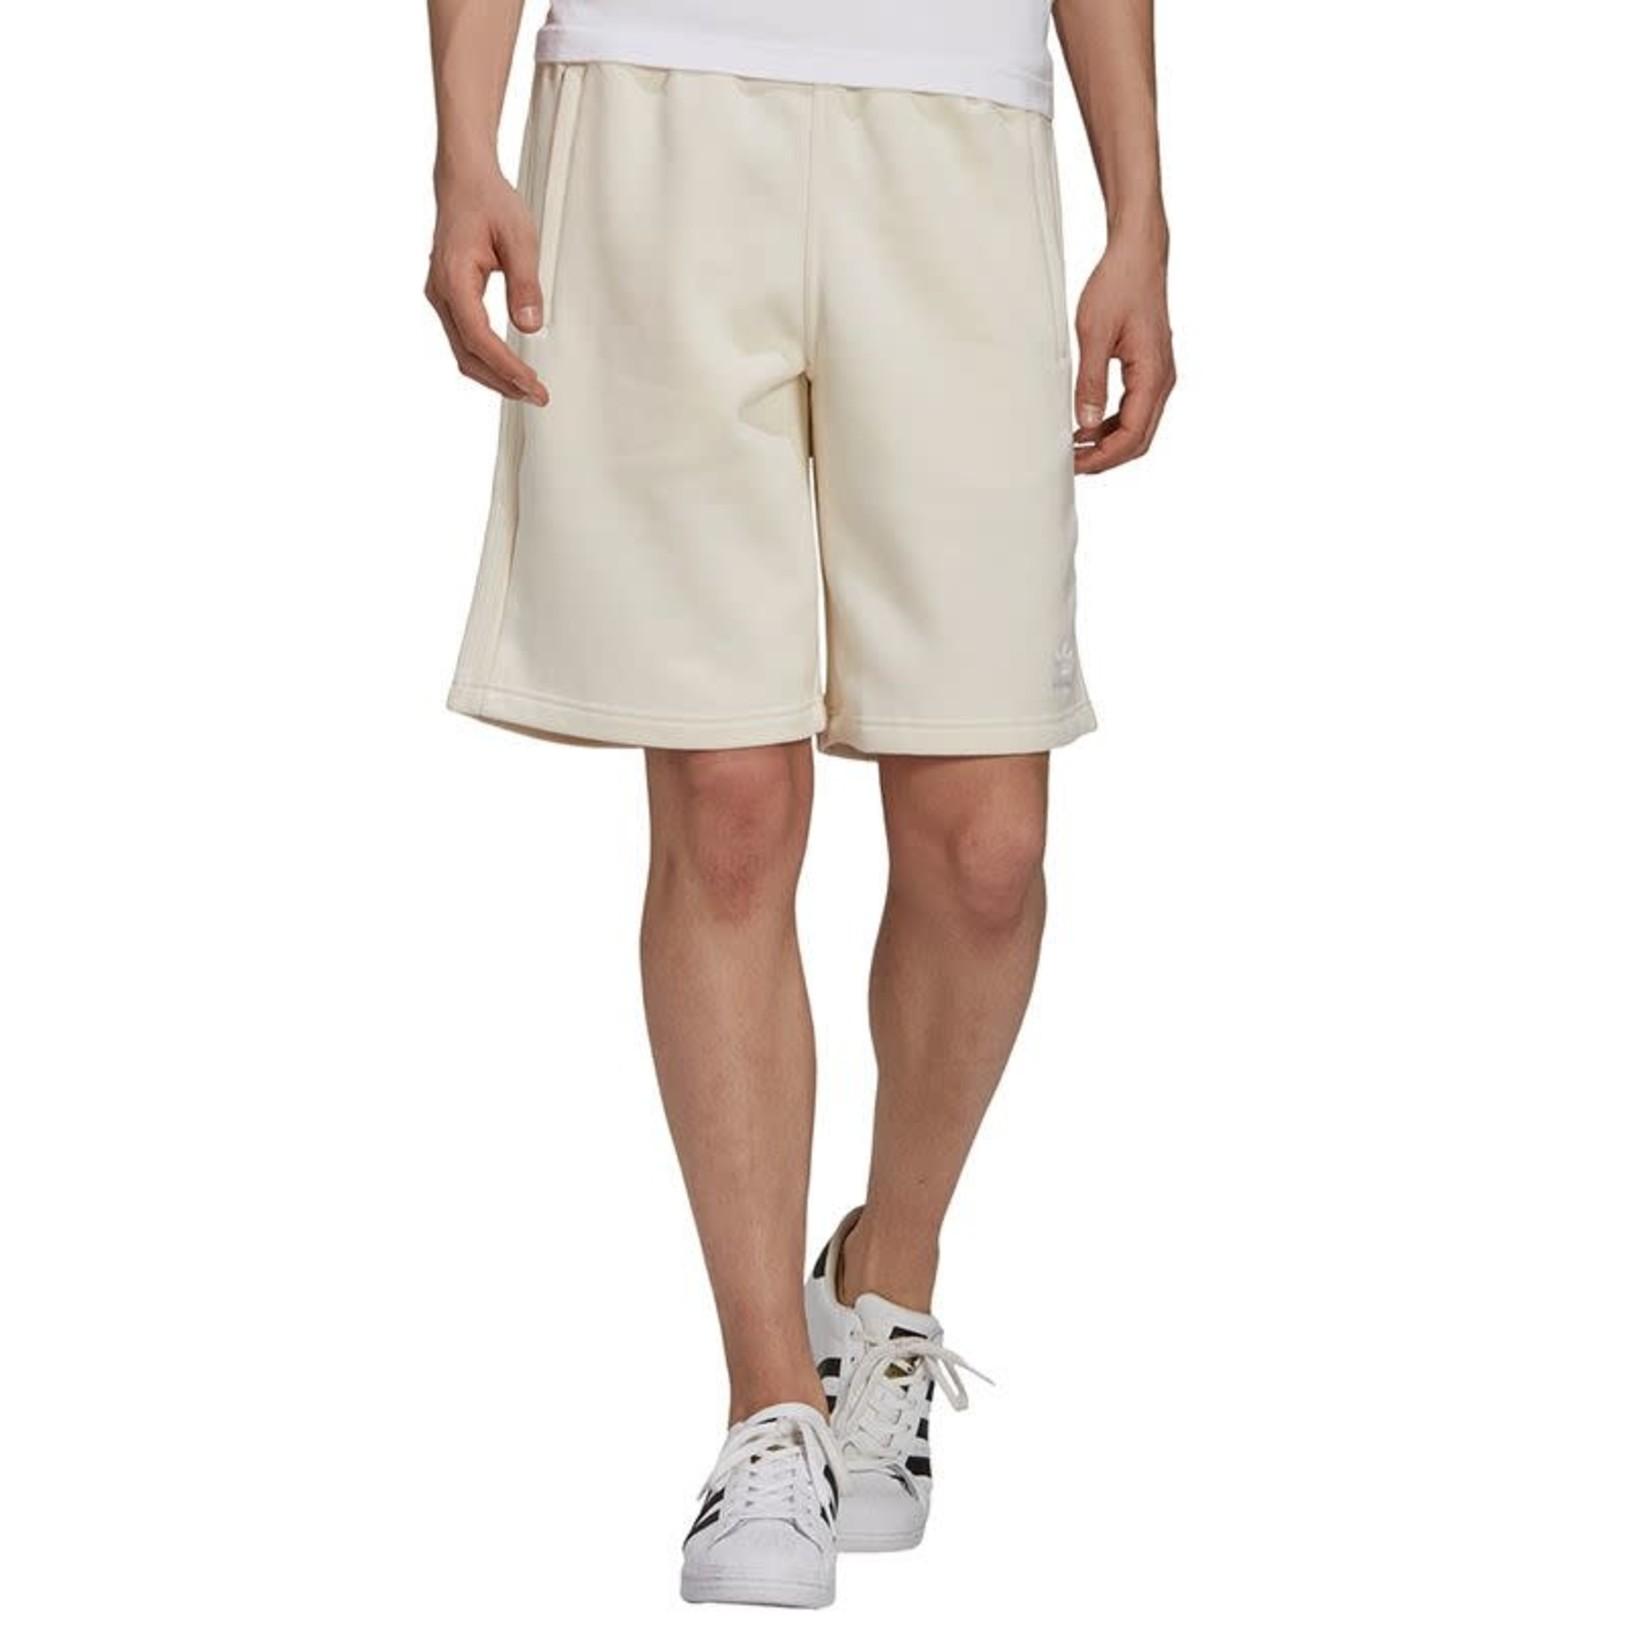 Adidas Adidas : 3 Stripes Non-Dyed Shorts